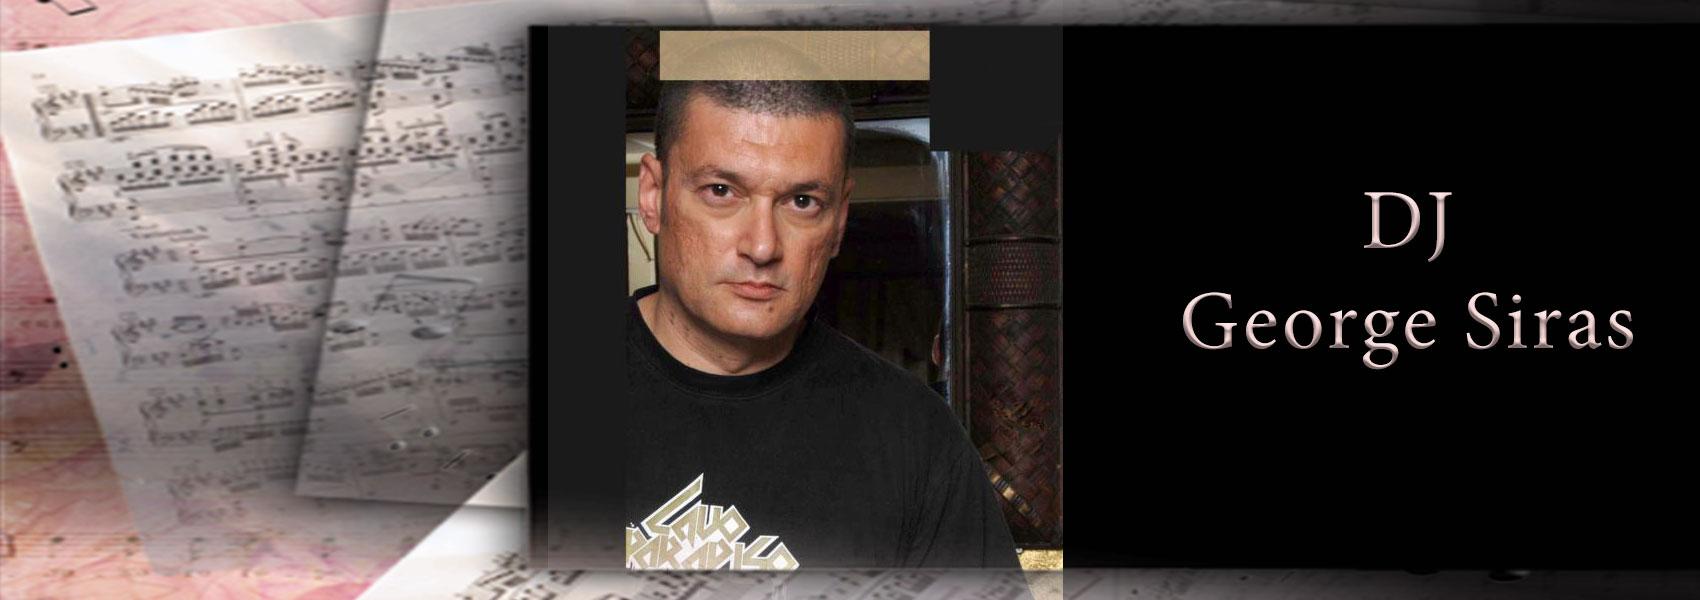 DJ GEORGE SIRAS